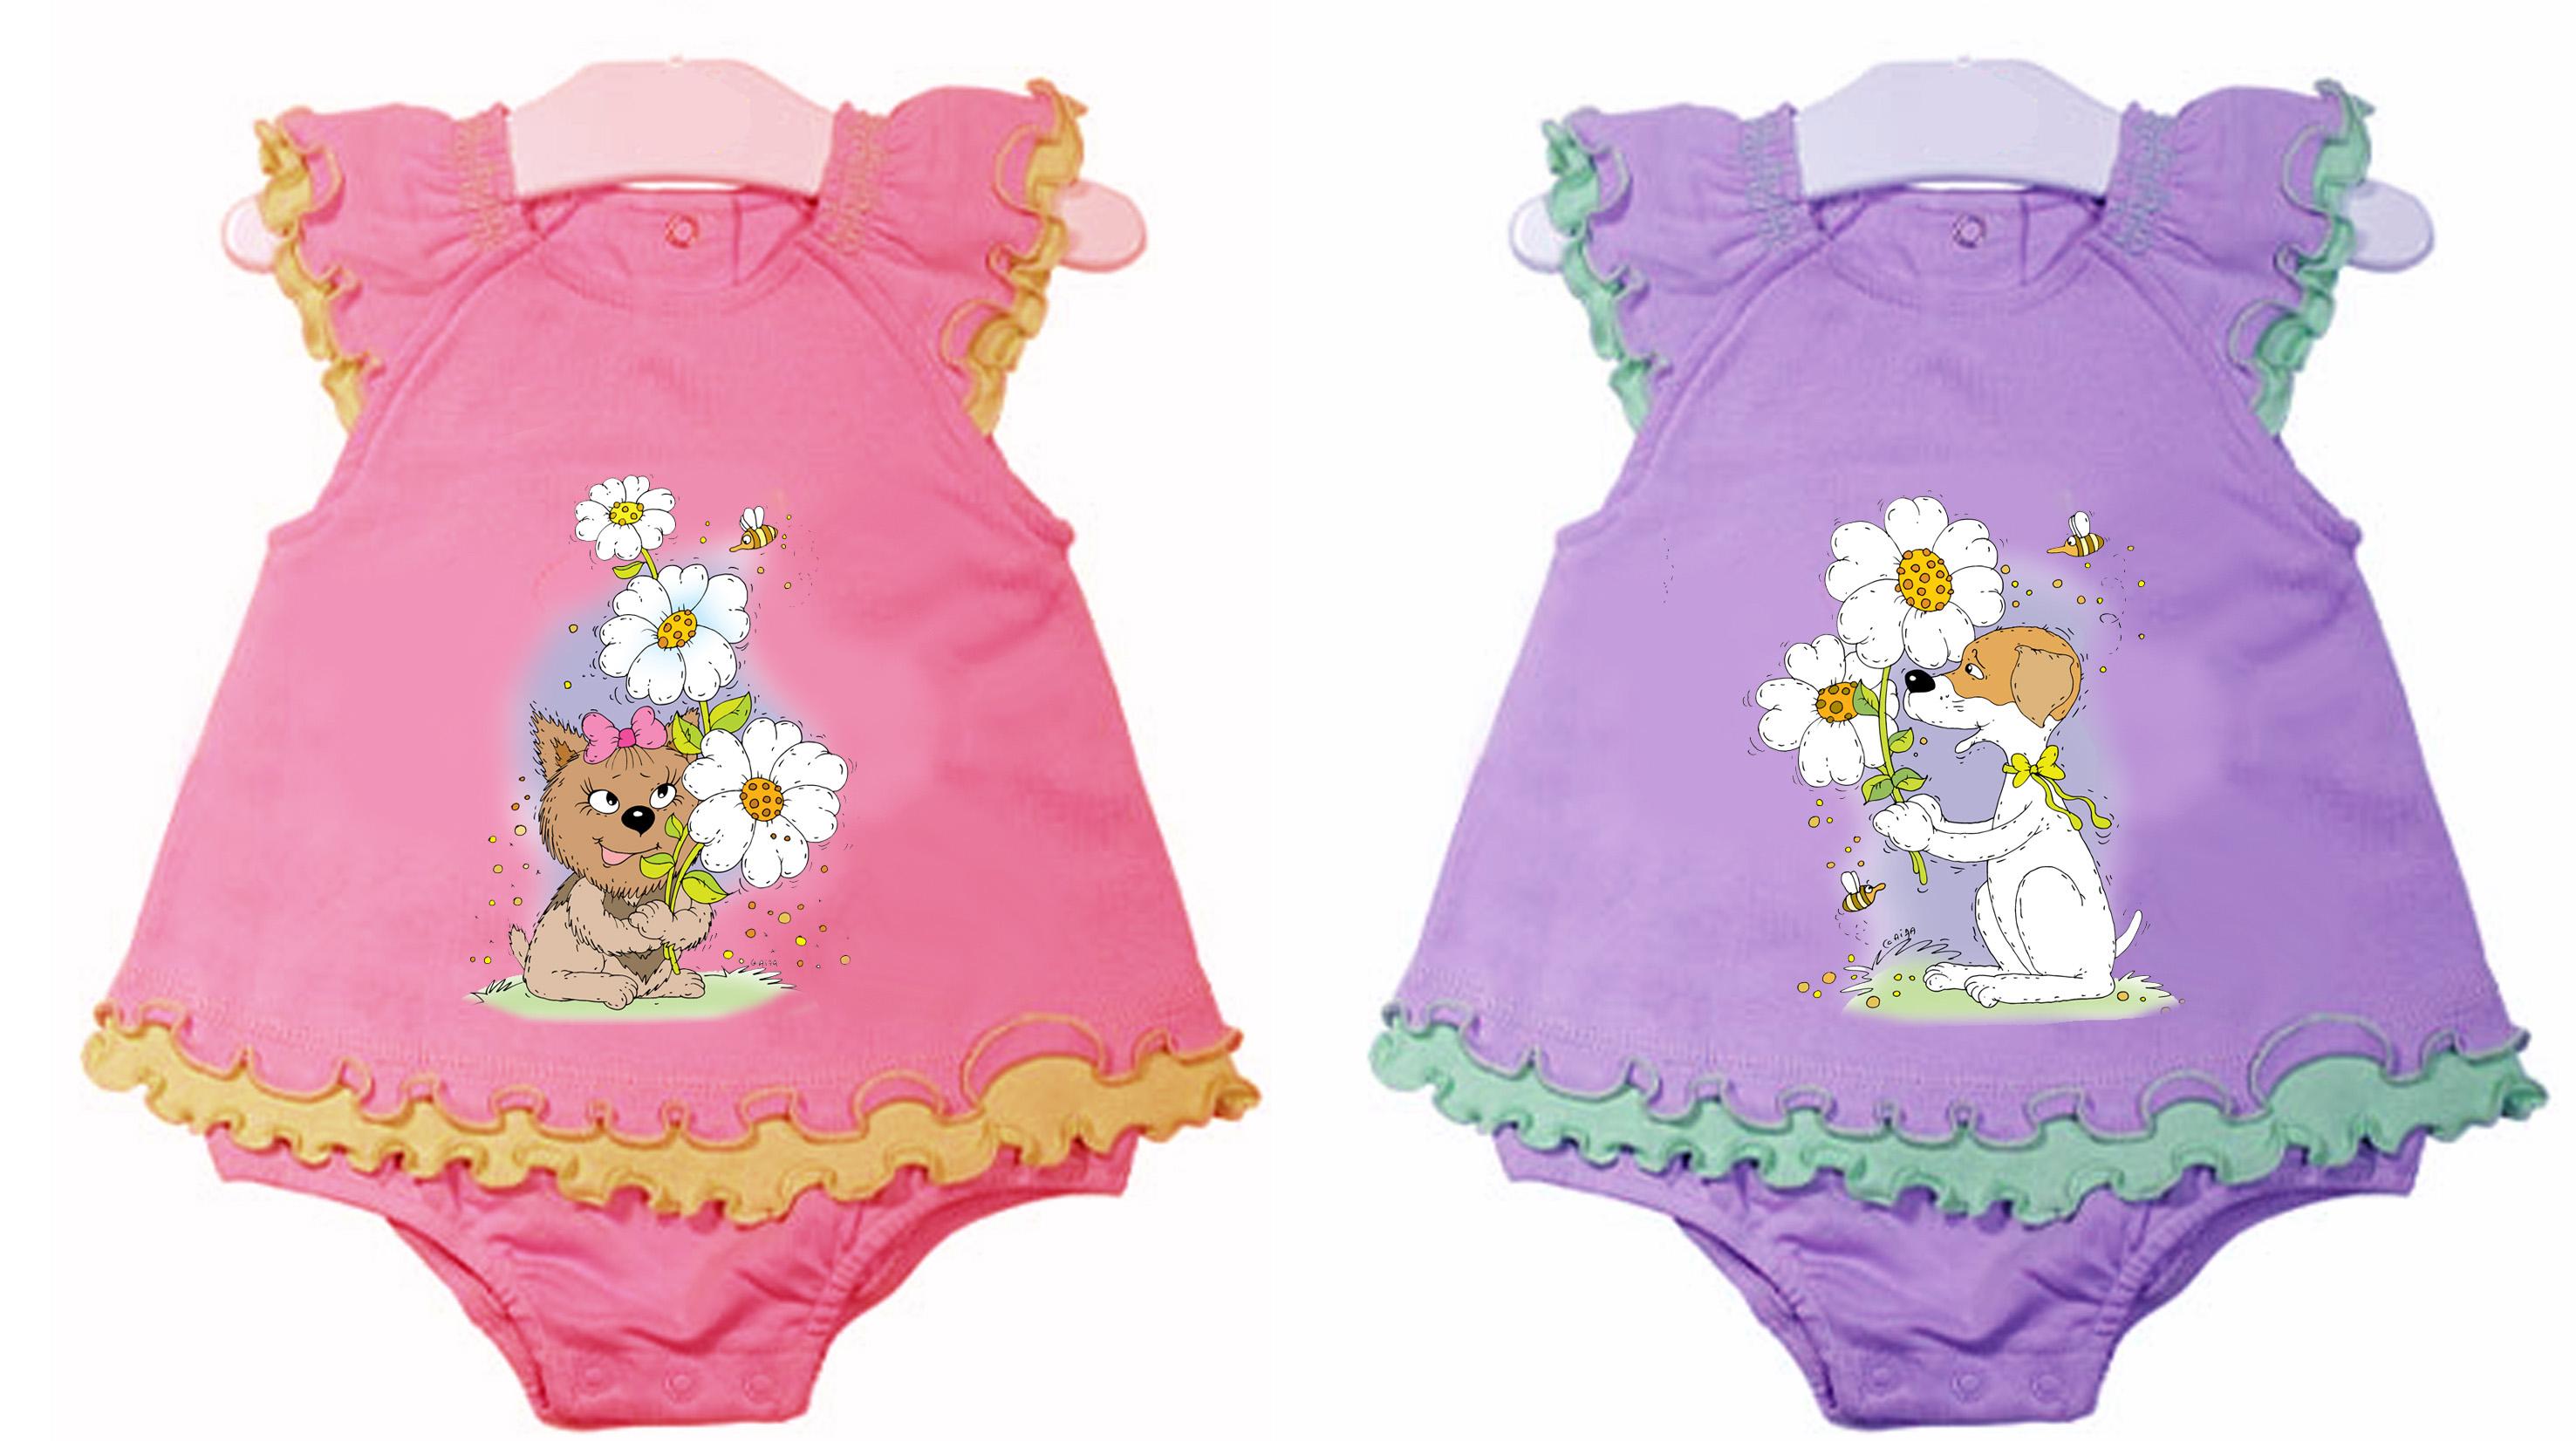 Baby Dress Designs